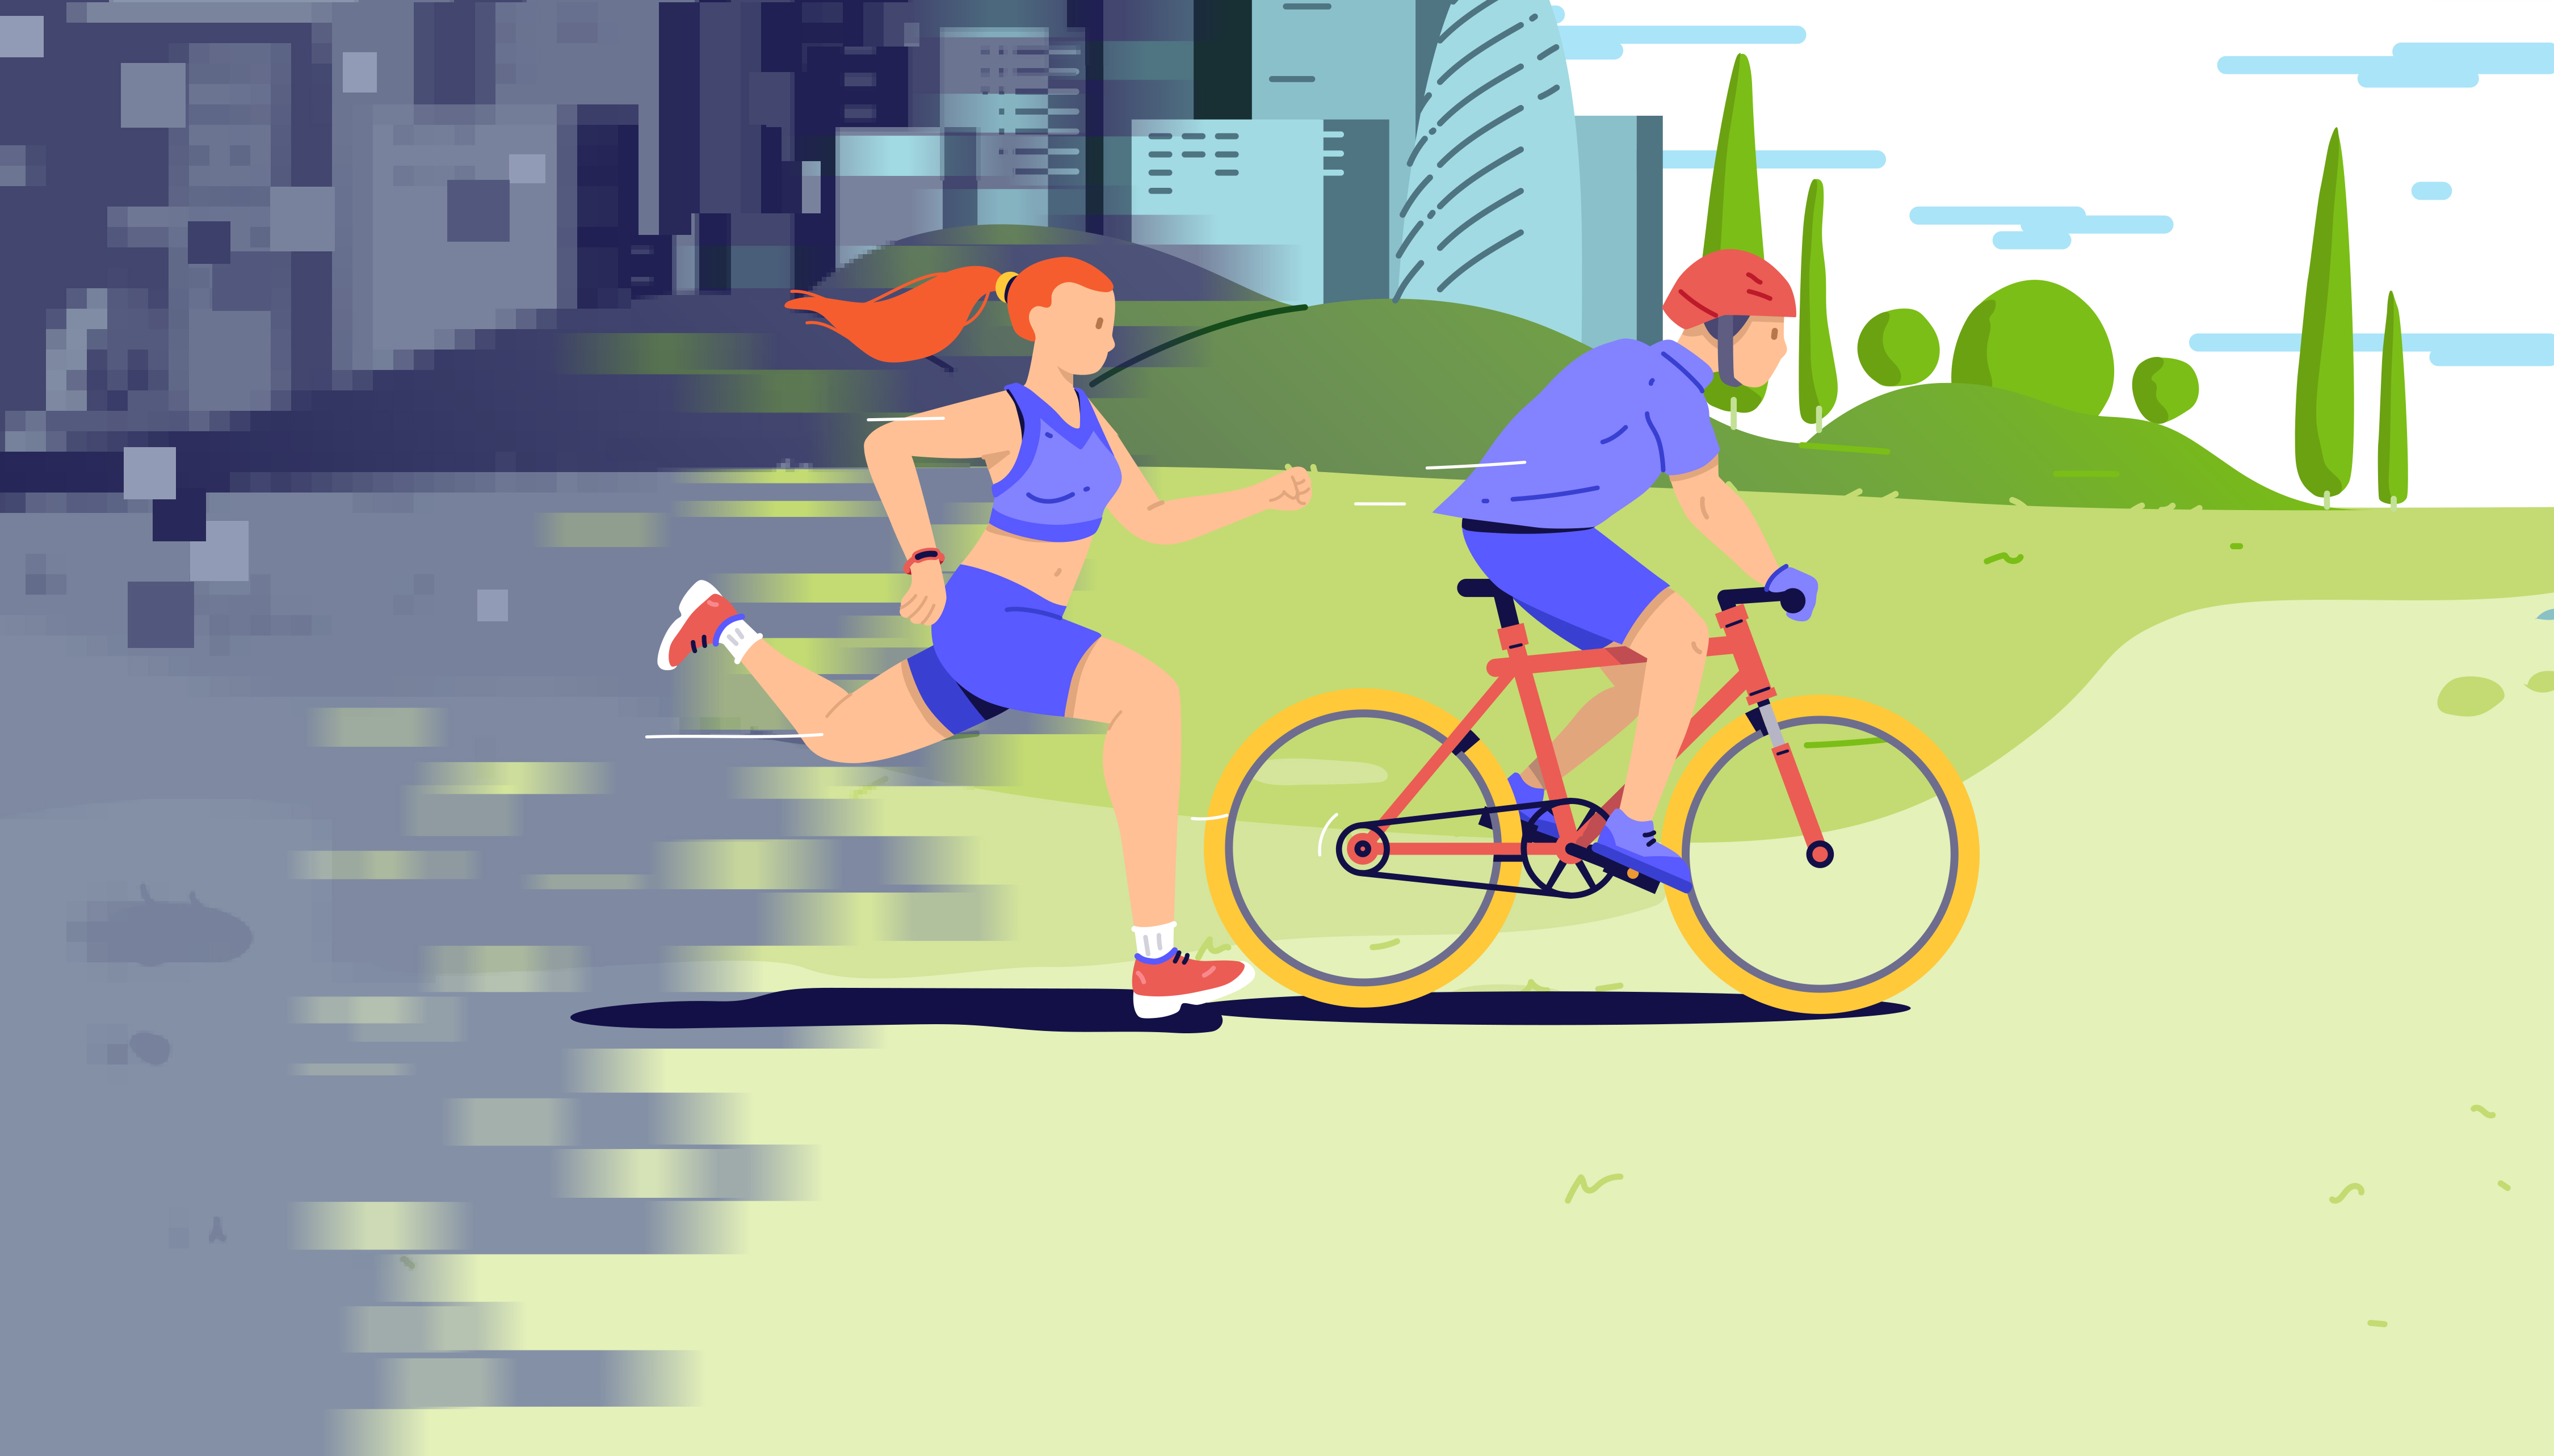 Cardio exercise can increase gut microbiome diversity